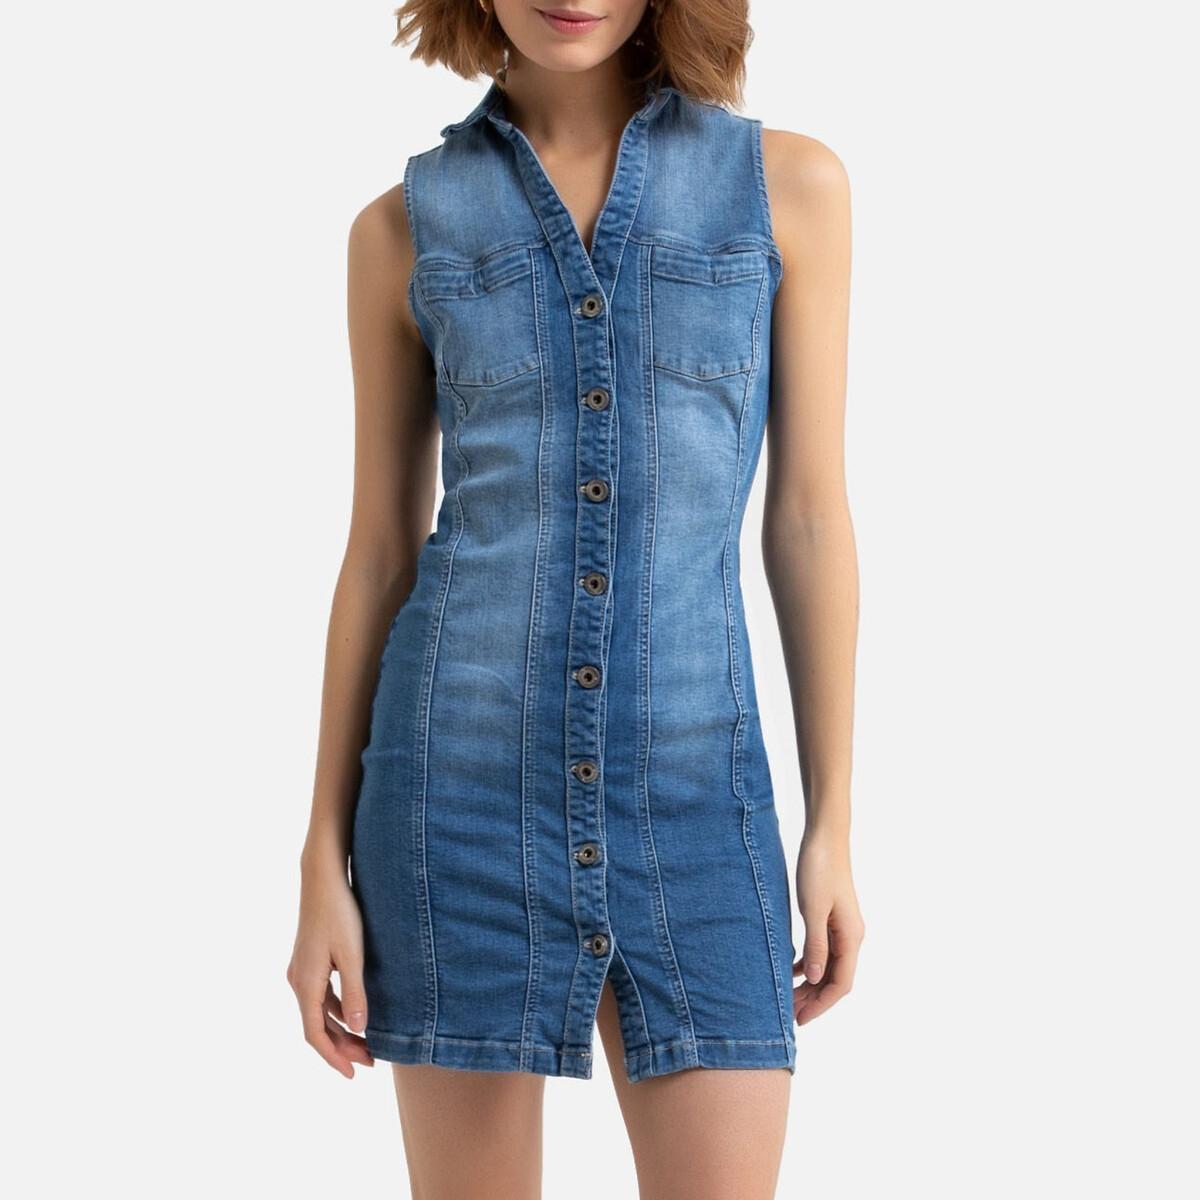 цена Платье La Redoute Короткое из денима Olyvia S-SDM L синий онлайн в 2017 году